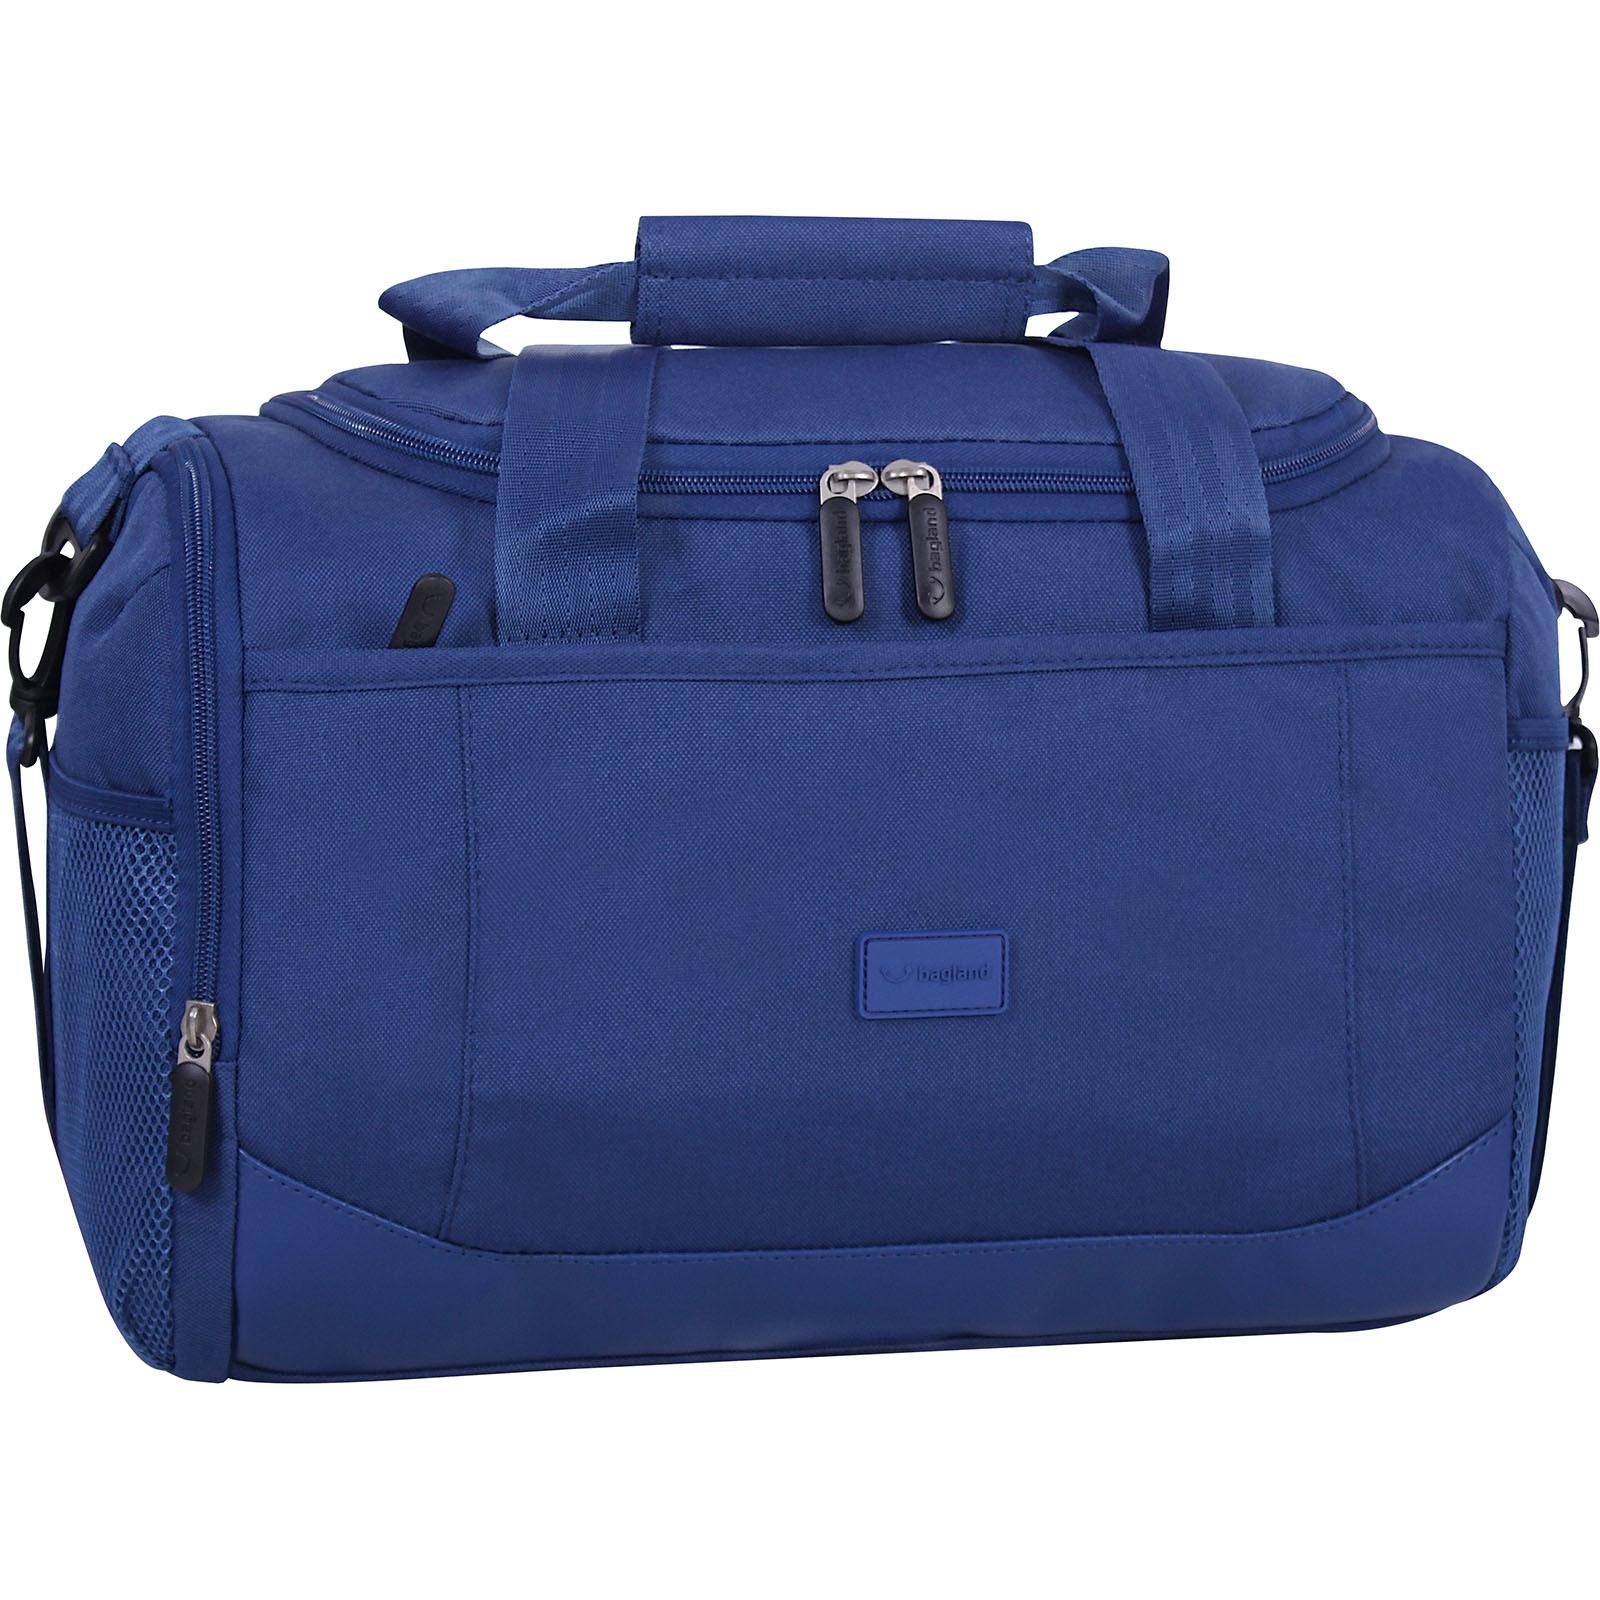 Дорожные сумки Сумка Bagland Albany 20 л. Синий (0032666) IMG_6212.JPG